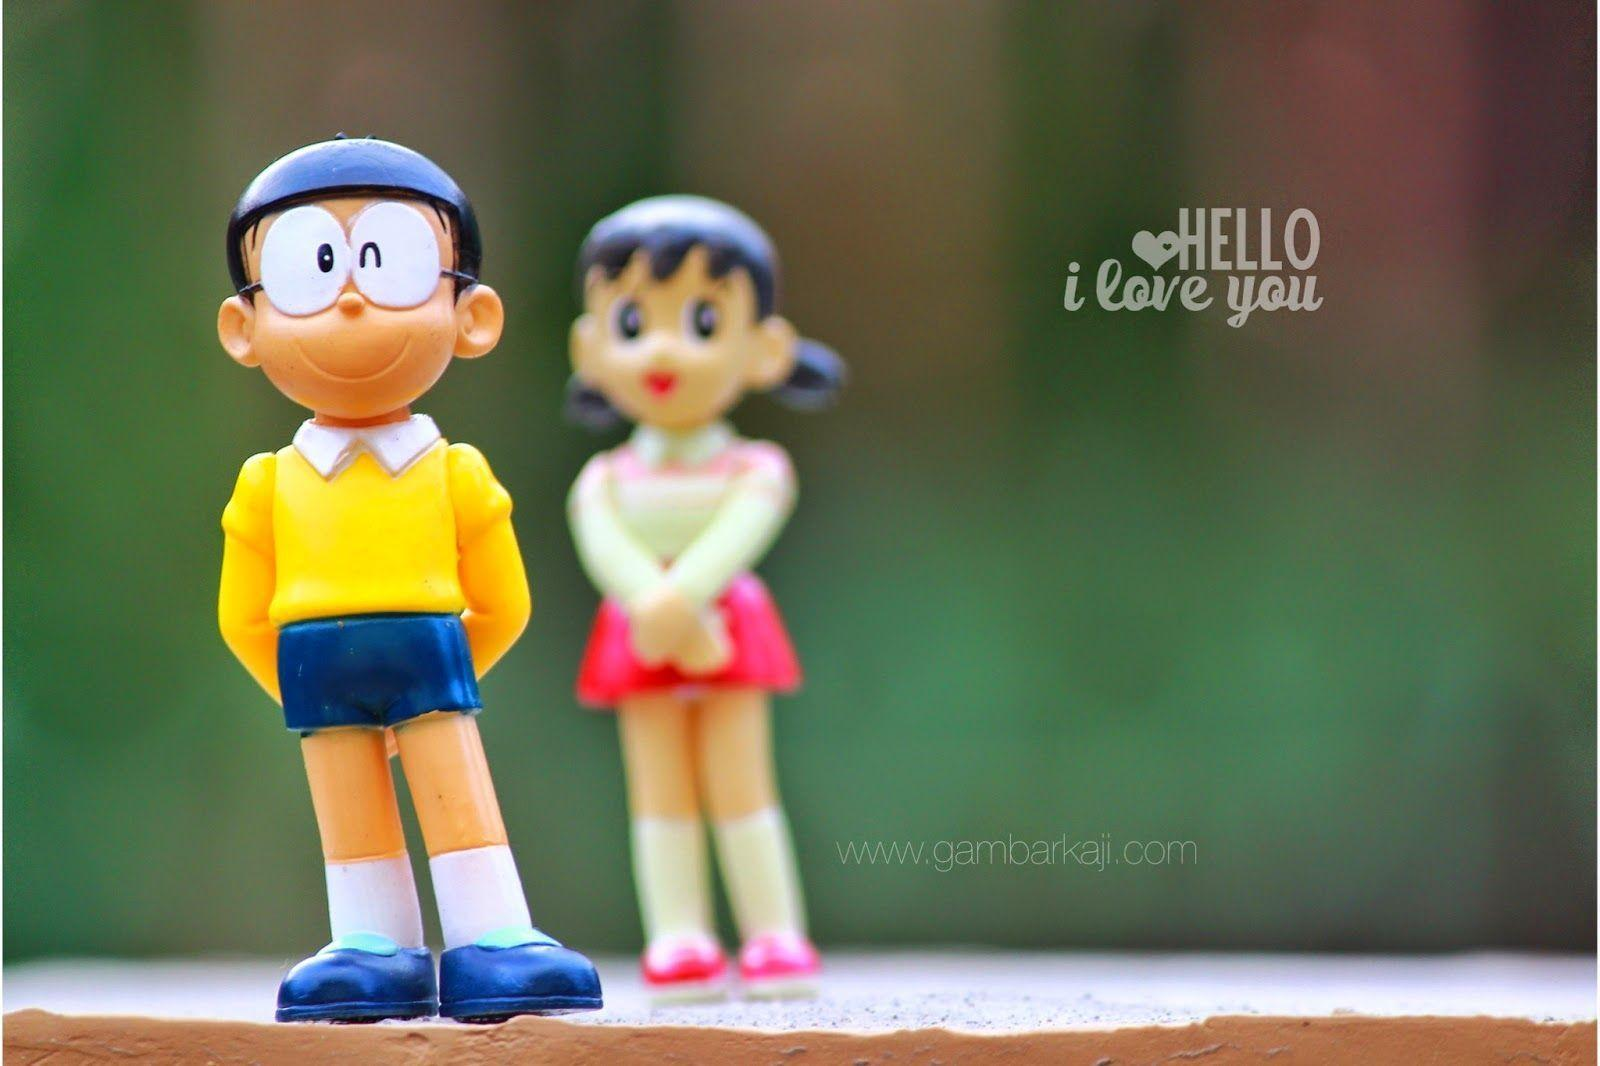 Doraemon Stand By Me 3D Photo HD Wallpaper Desktop Backgrounds Free